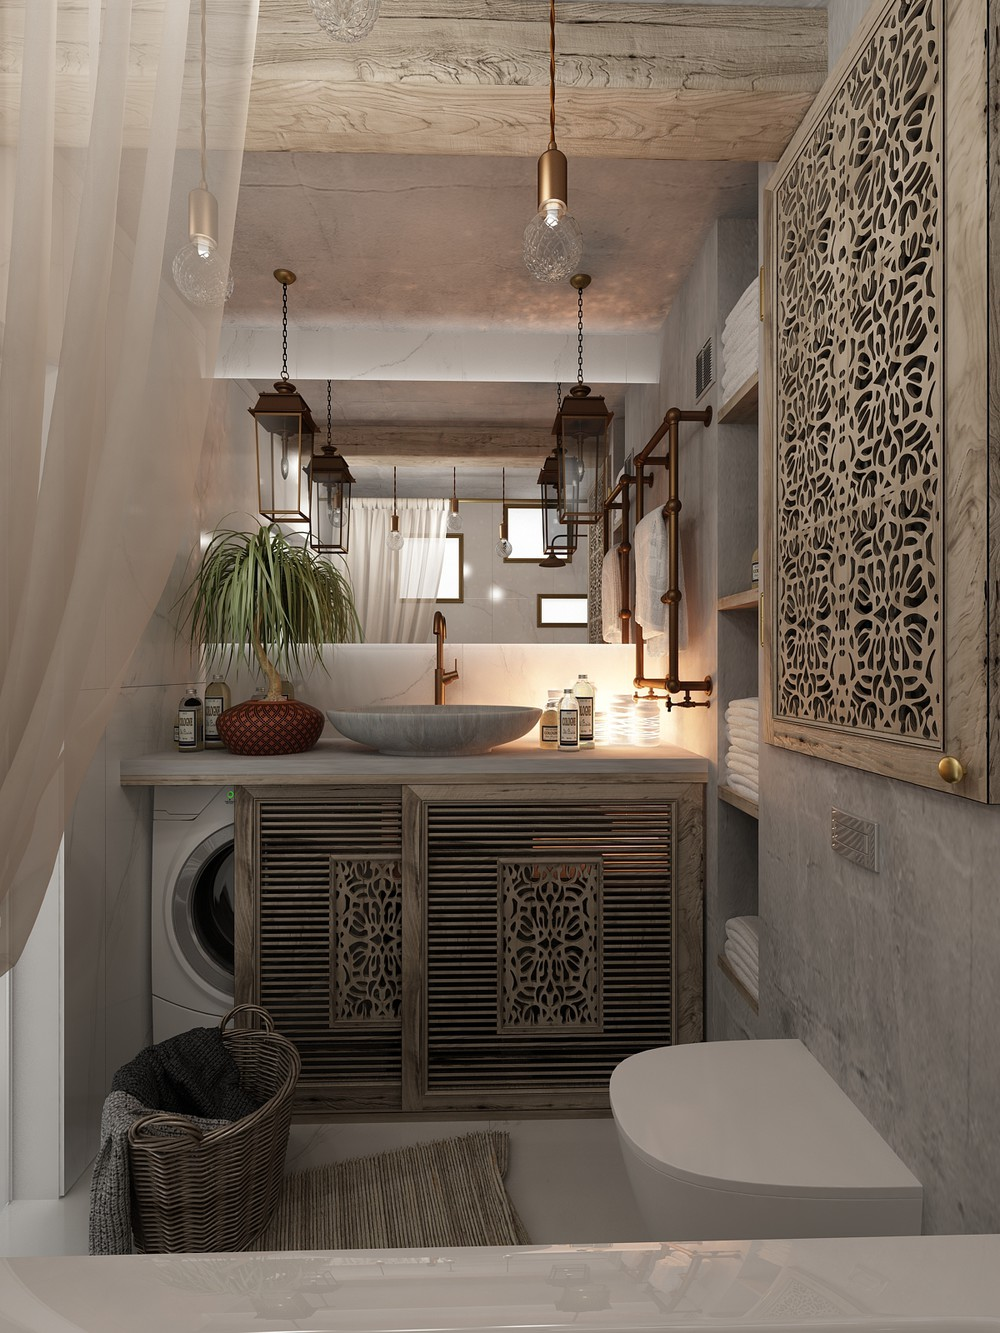 intricate-bath-design.jpg